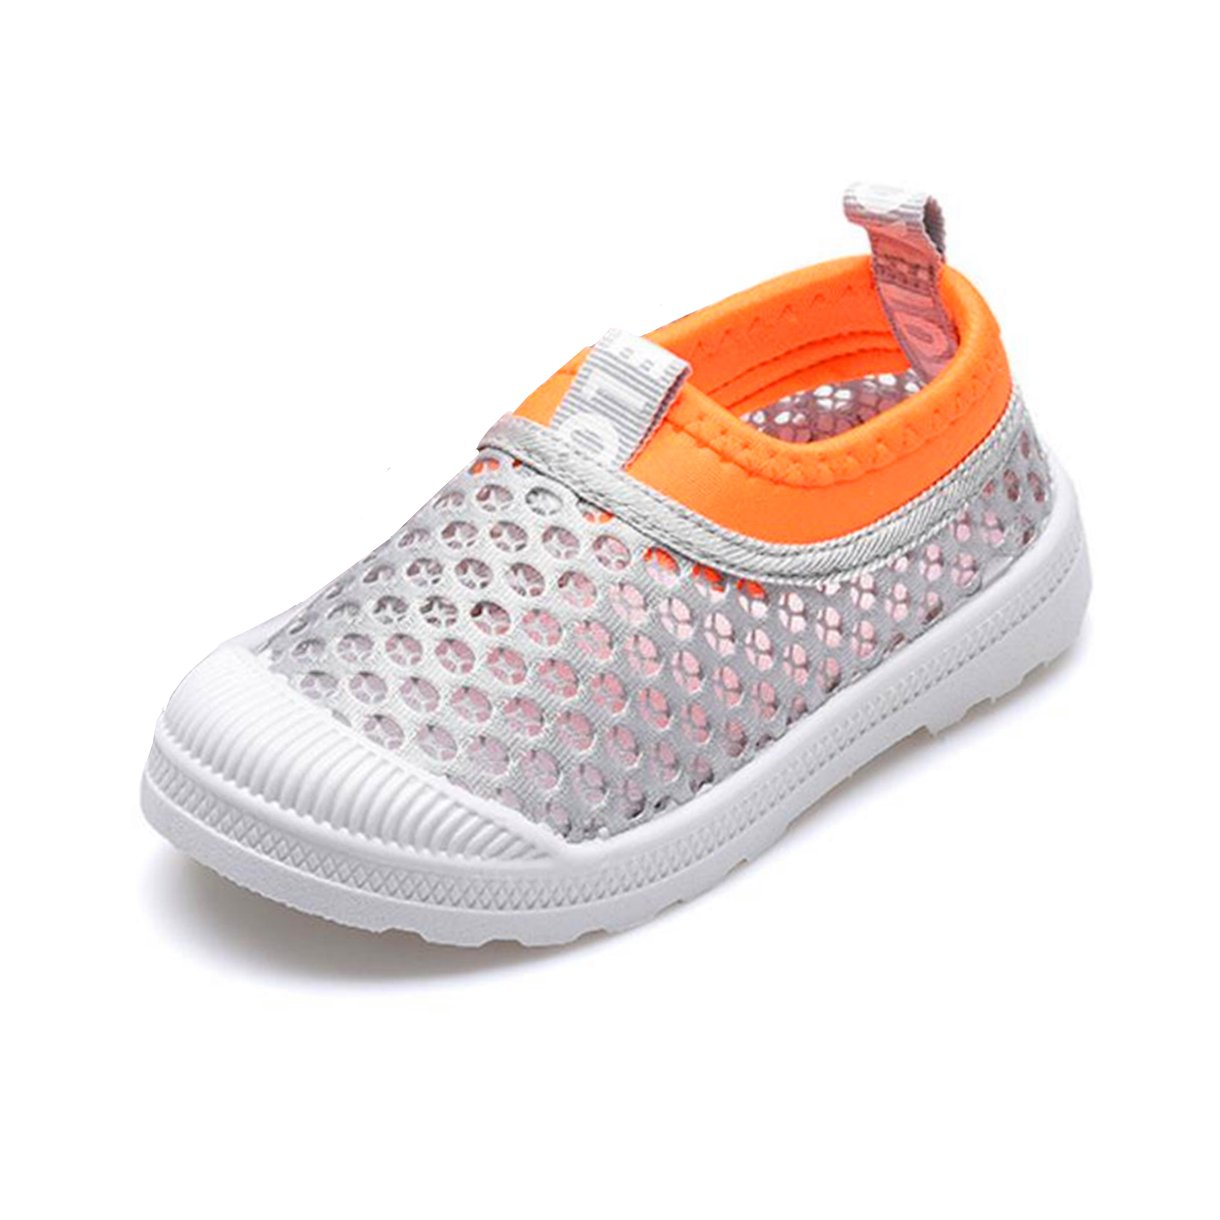 RVROVIC Kids Slip-on Breathable Mesh Sneakers Summer Beach Water Shoes Toddler/Little Kid (11 M US Little Kid, 1-Grey)